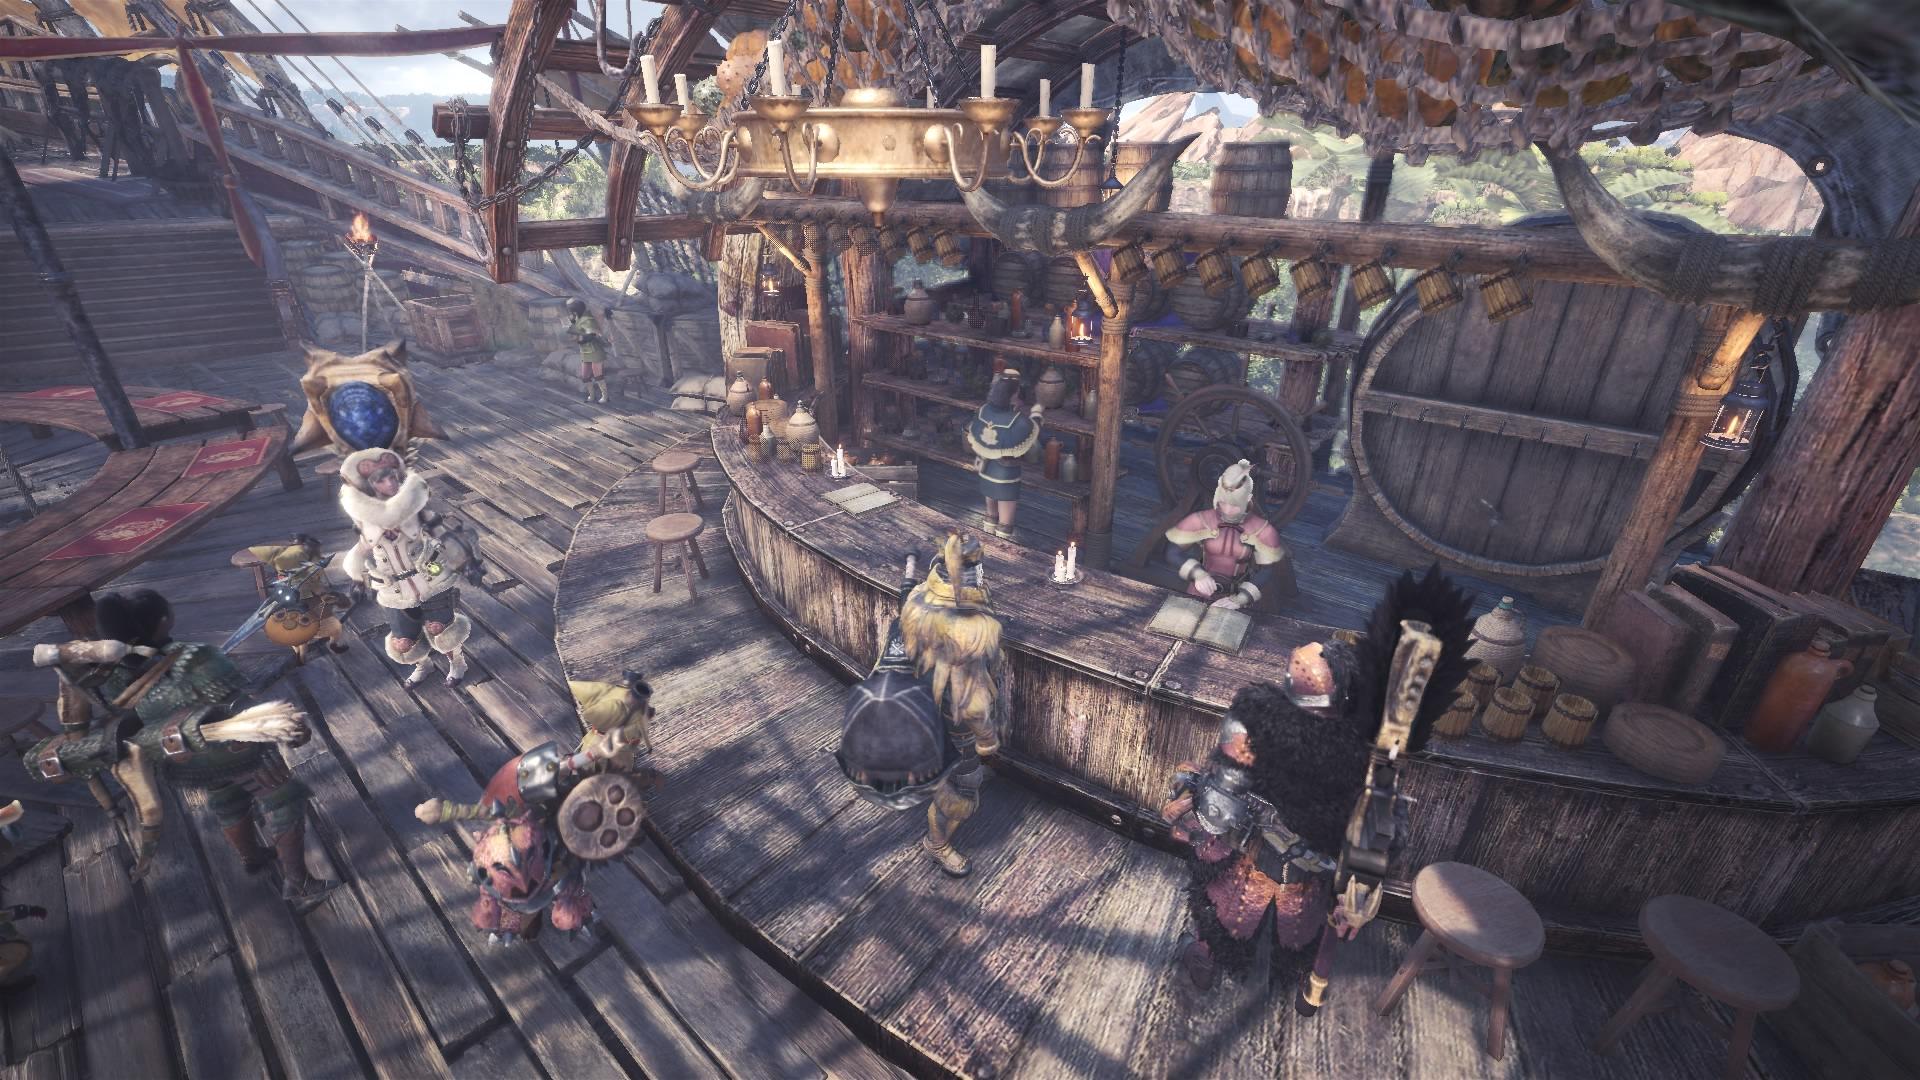 Multiplayer de Monster Hunter: World leva os jogadores a uma caçada alucinante.